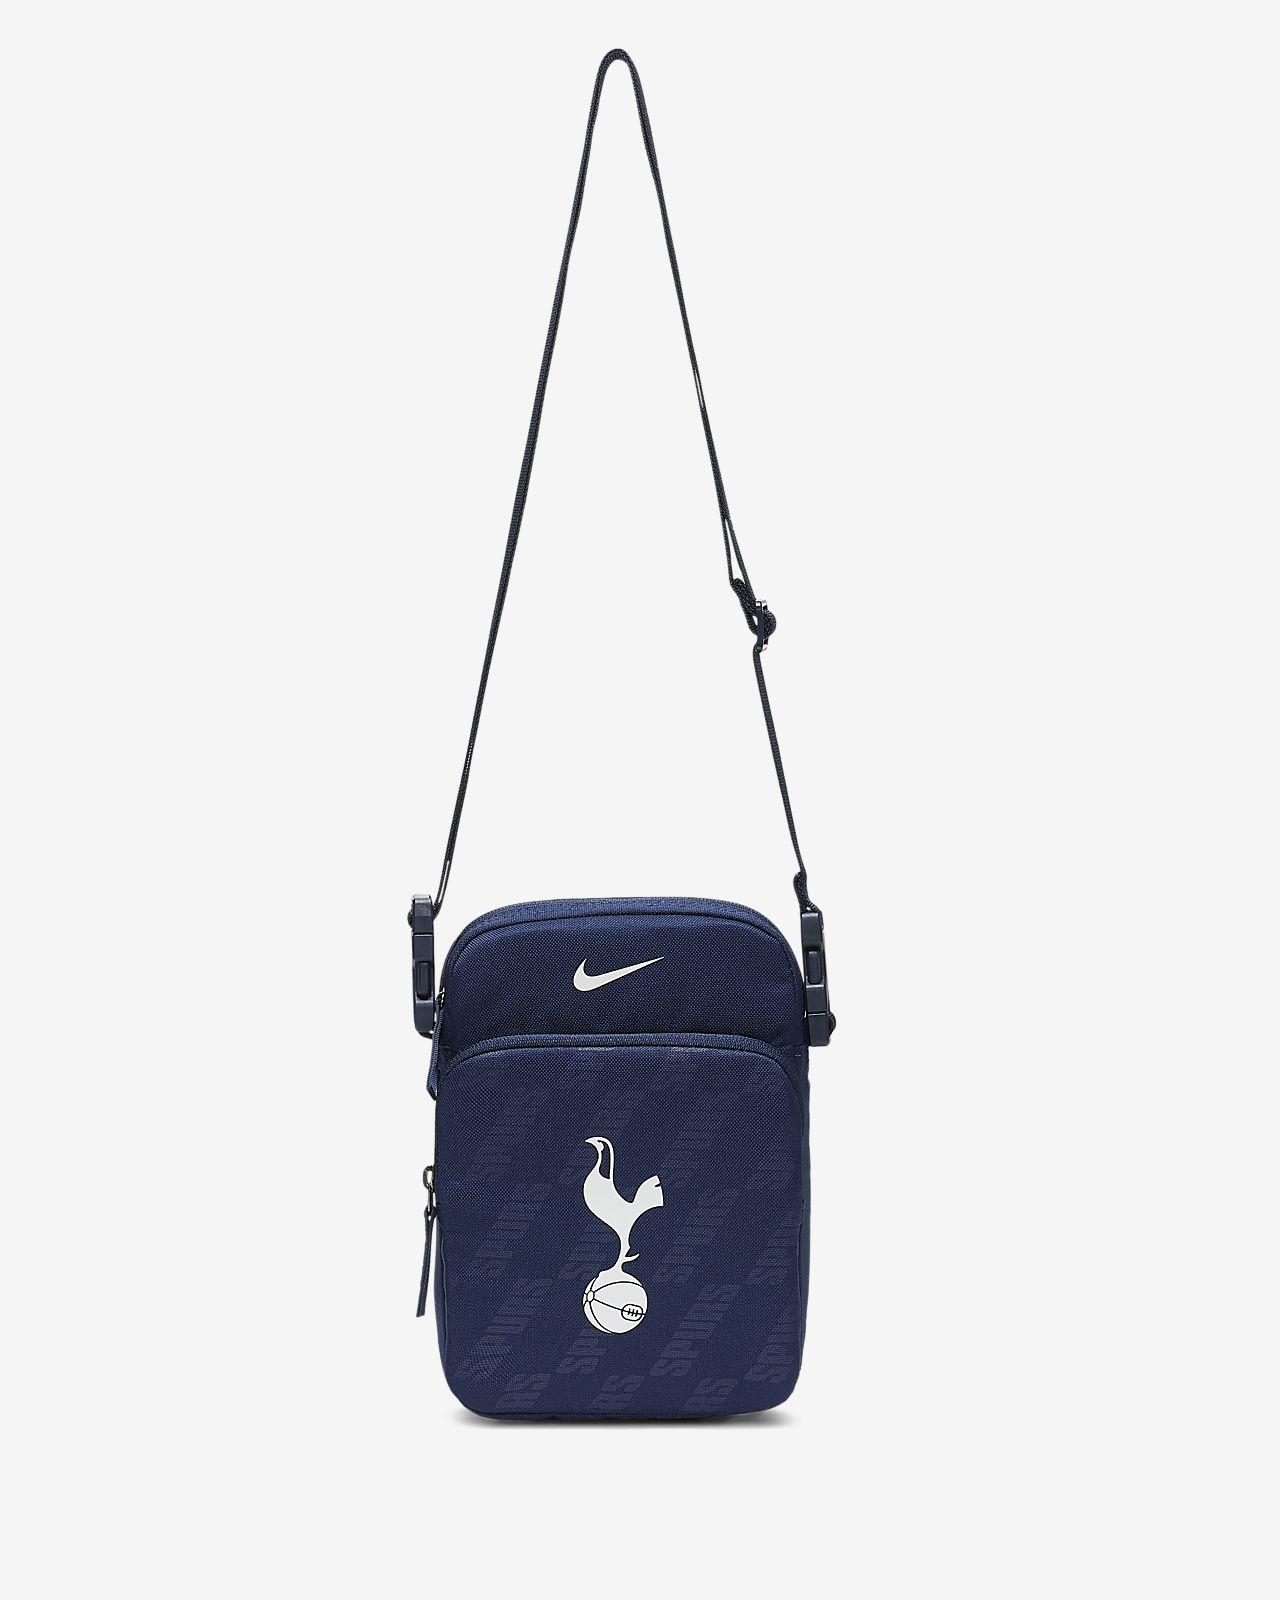 Tottenham Hotspur Stadium Small Items Bag